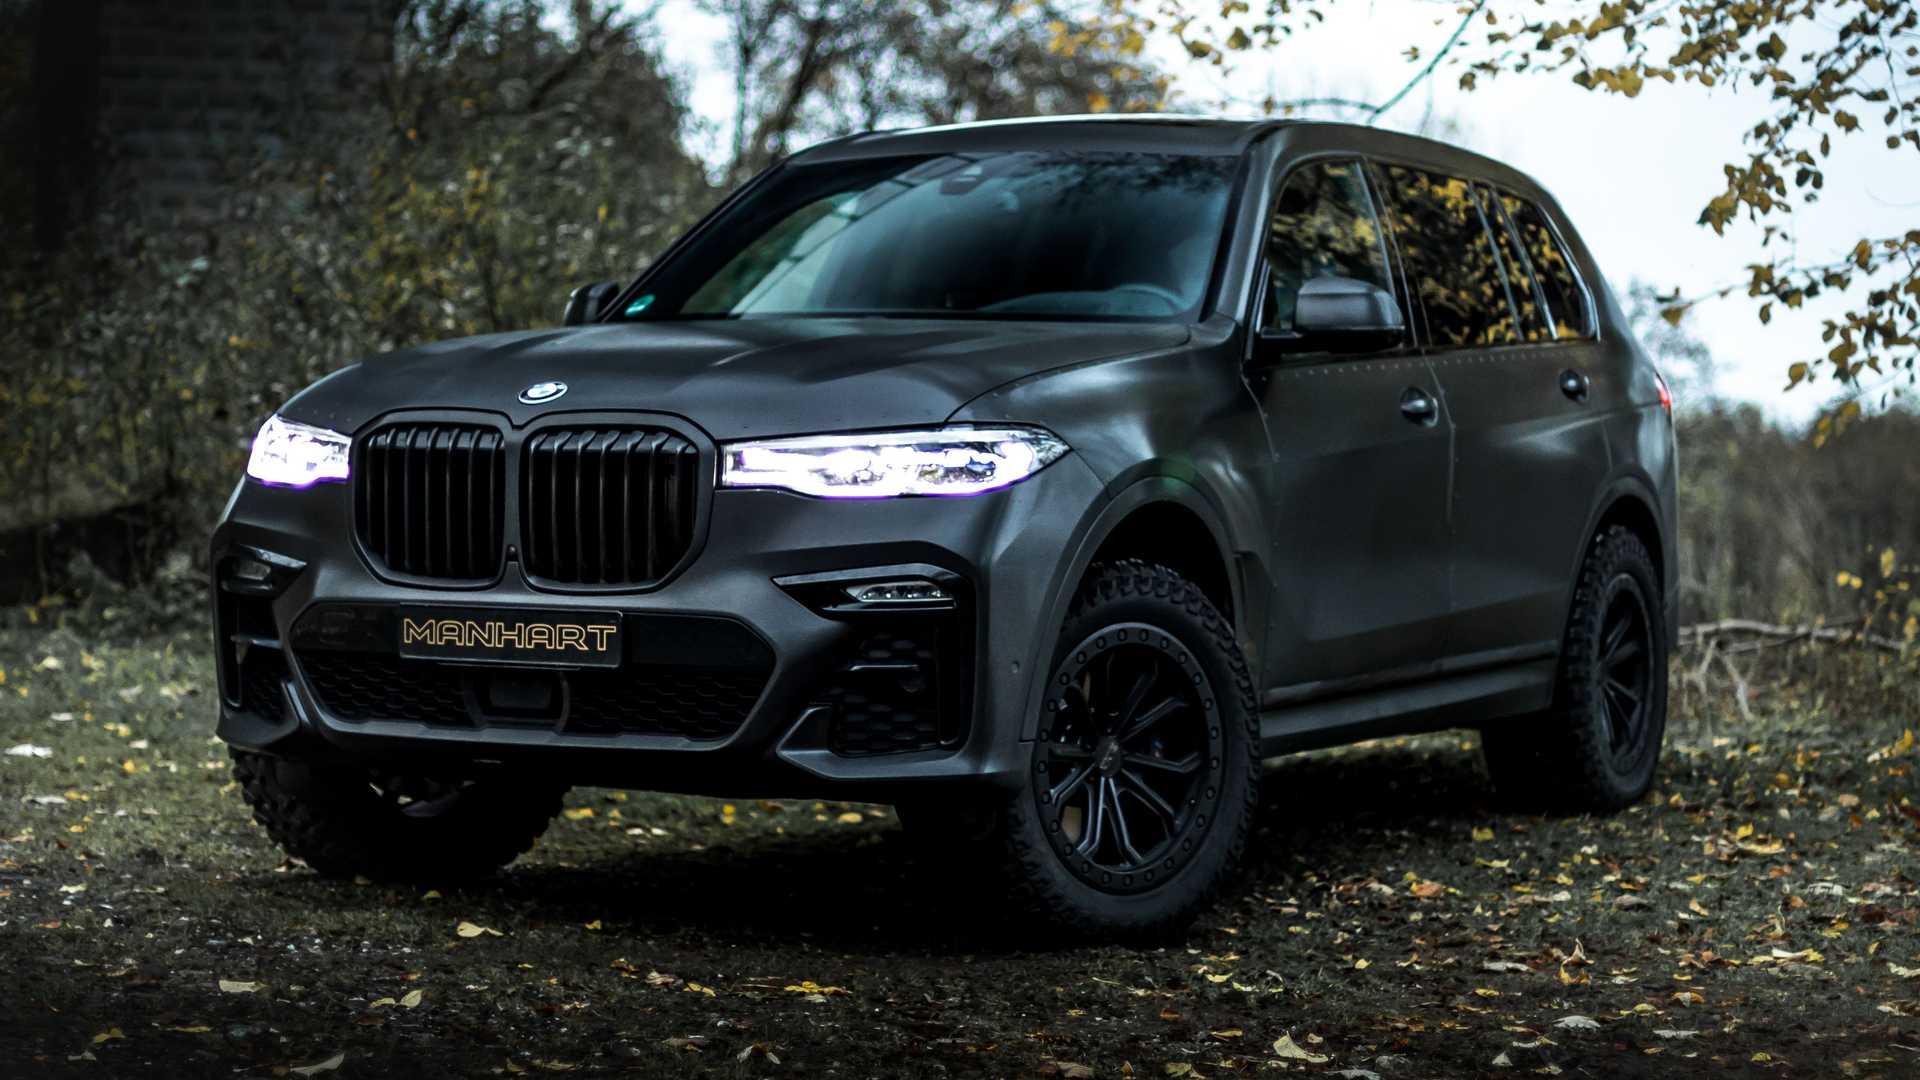 BMW-X7-Dirt-Edition-By-Manhart-5